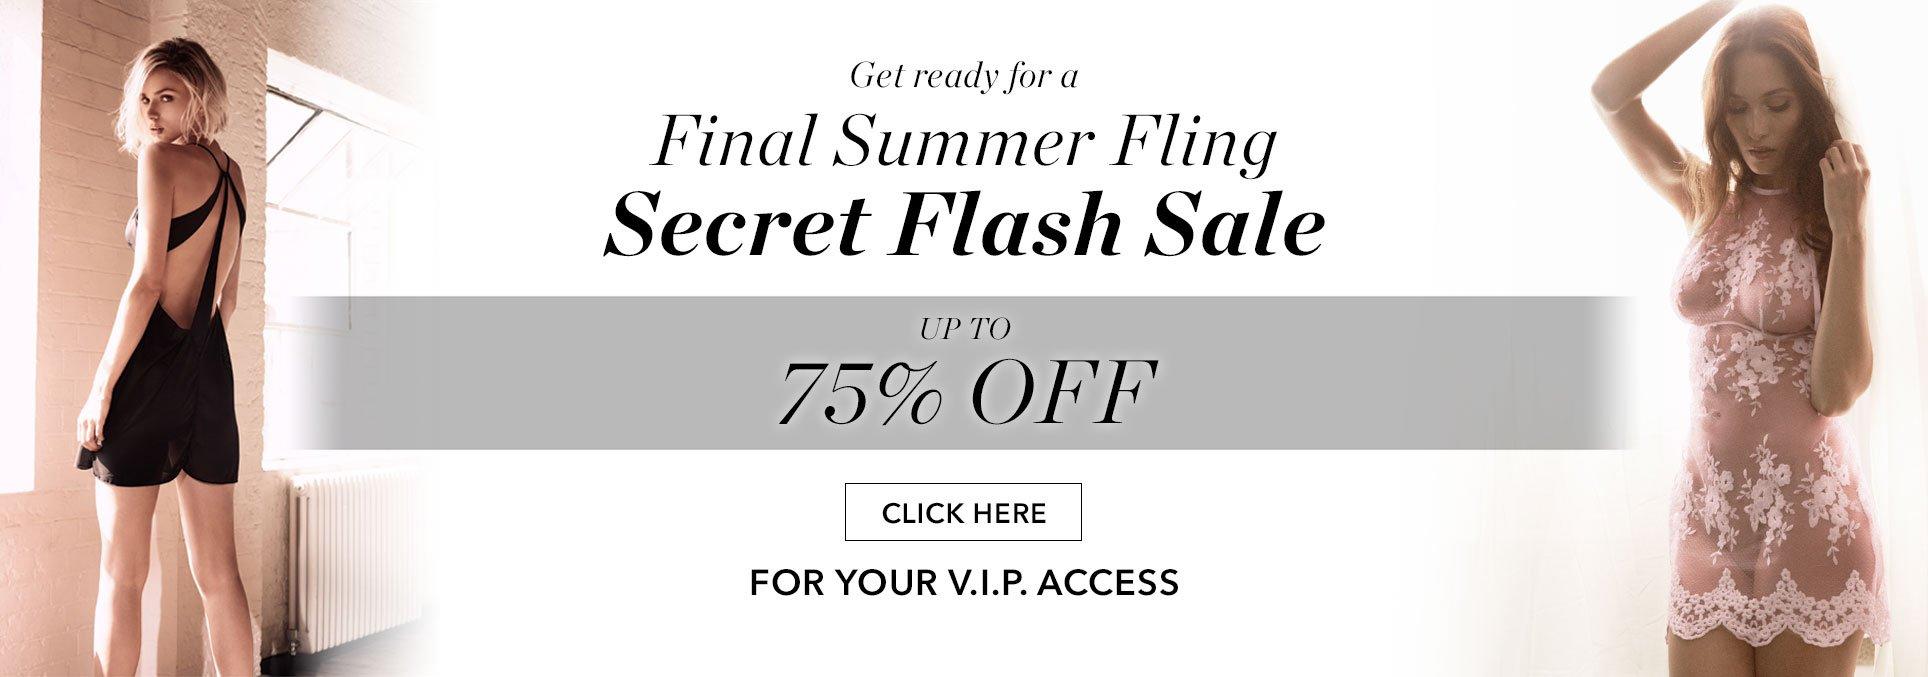 Bluebella Bluebella: Final Summer Sale up to 75% off lingerie